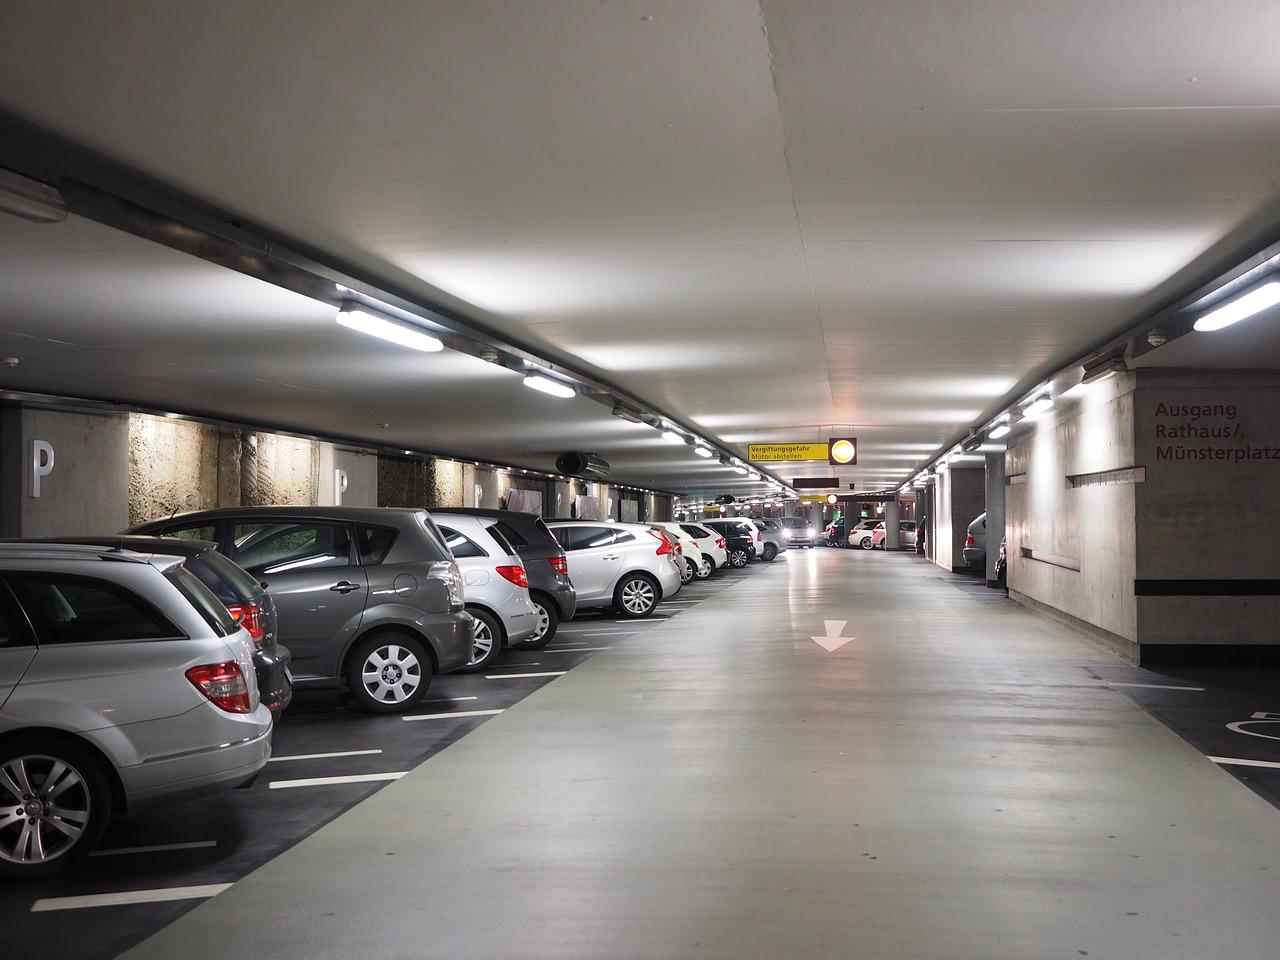 Multi storey car park 1271919 1280